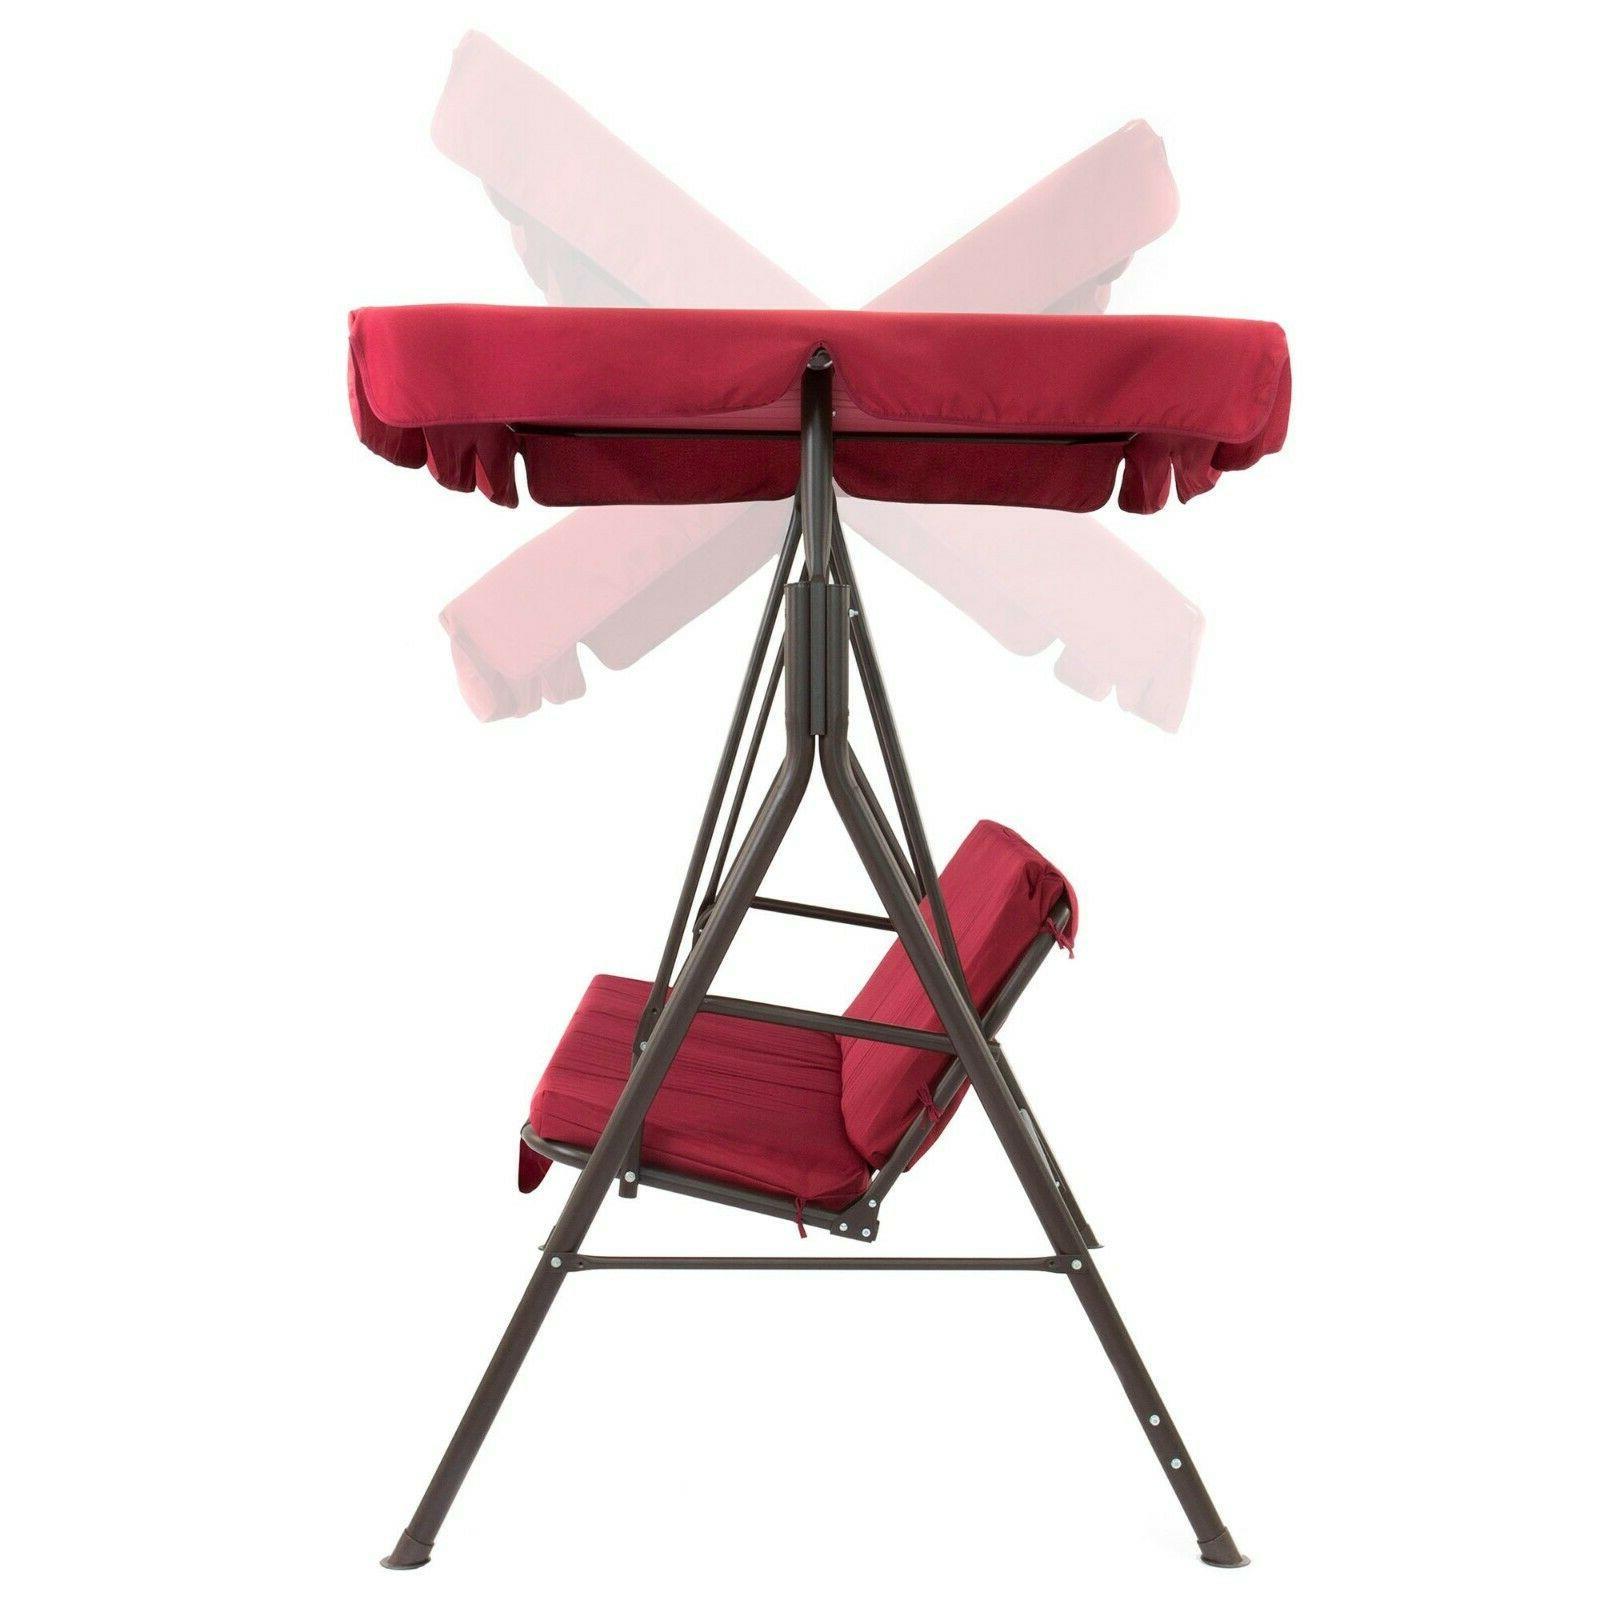 2 Swing Furniture Porch Bench Steel